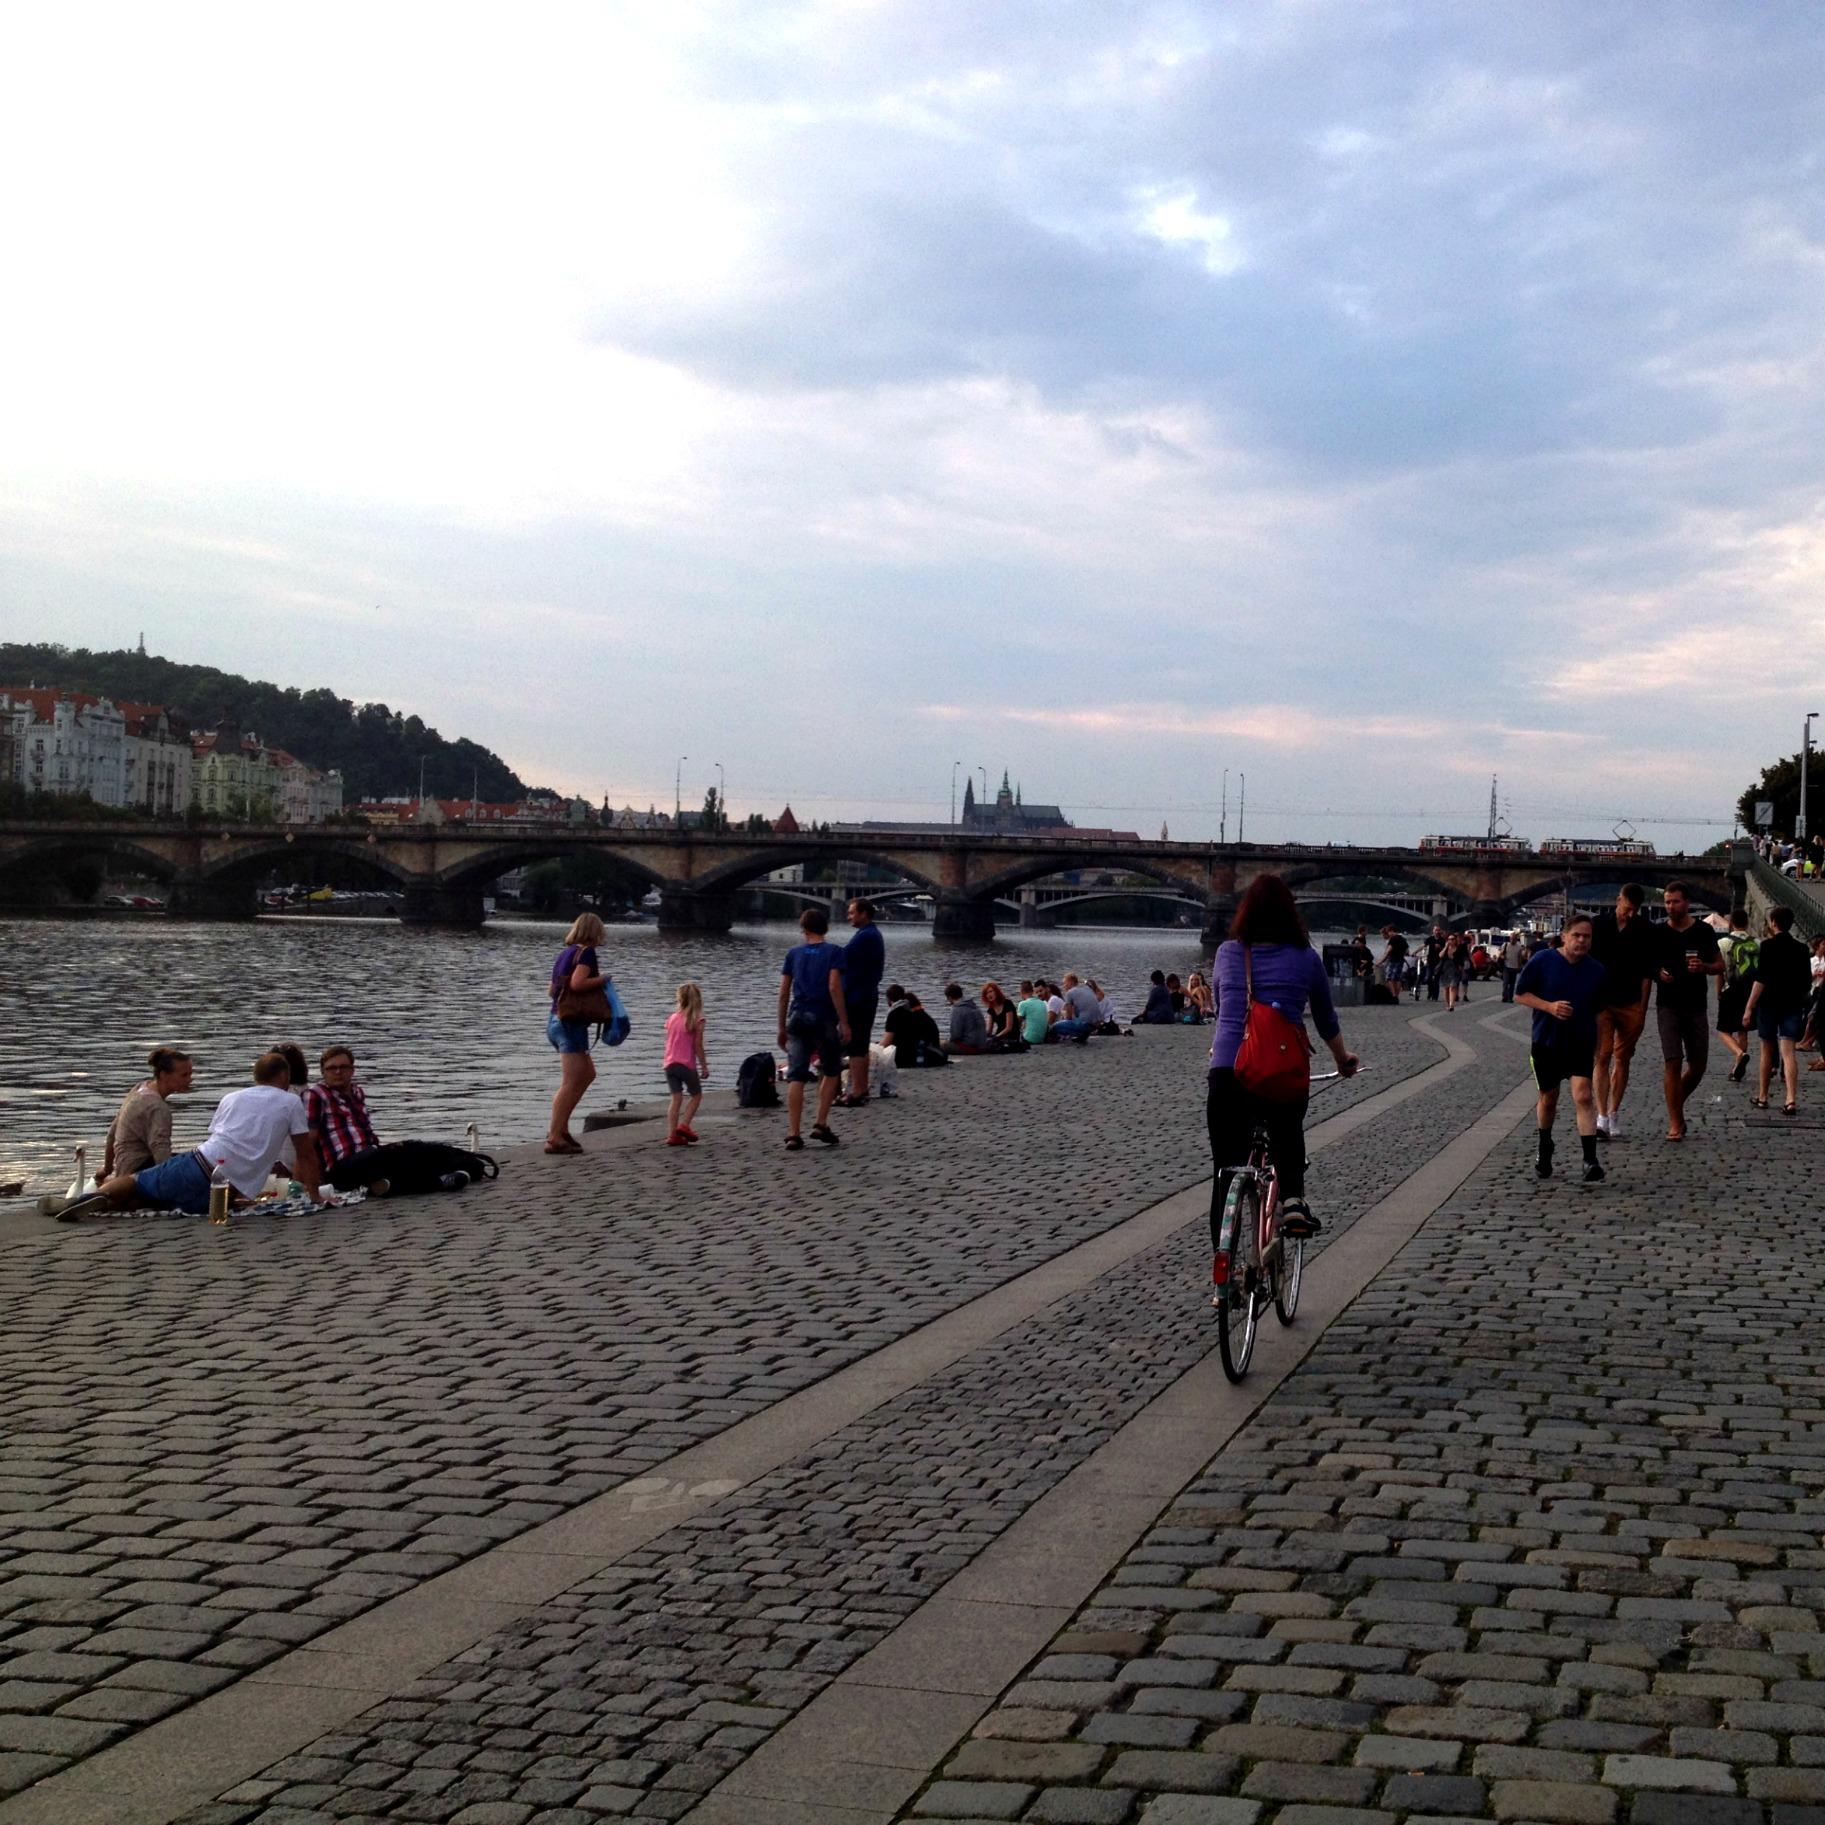 Naplavka Prague